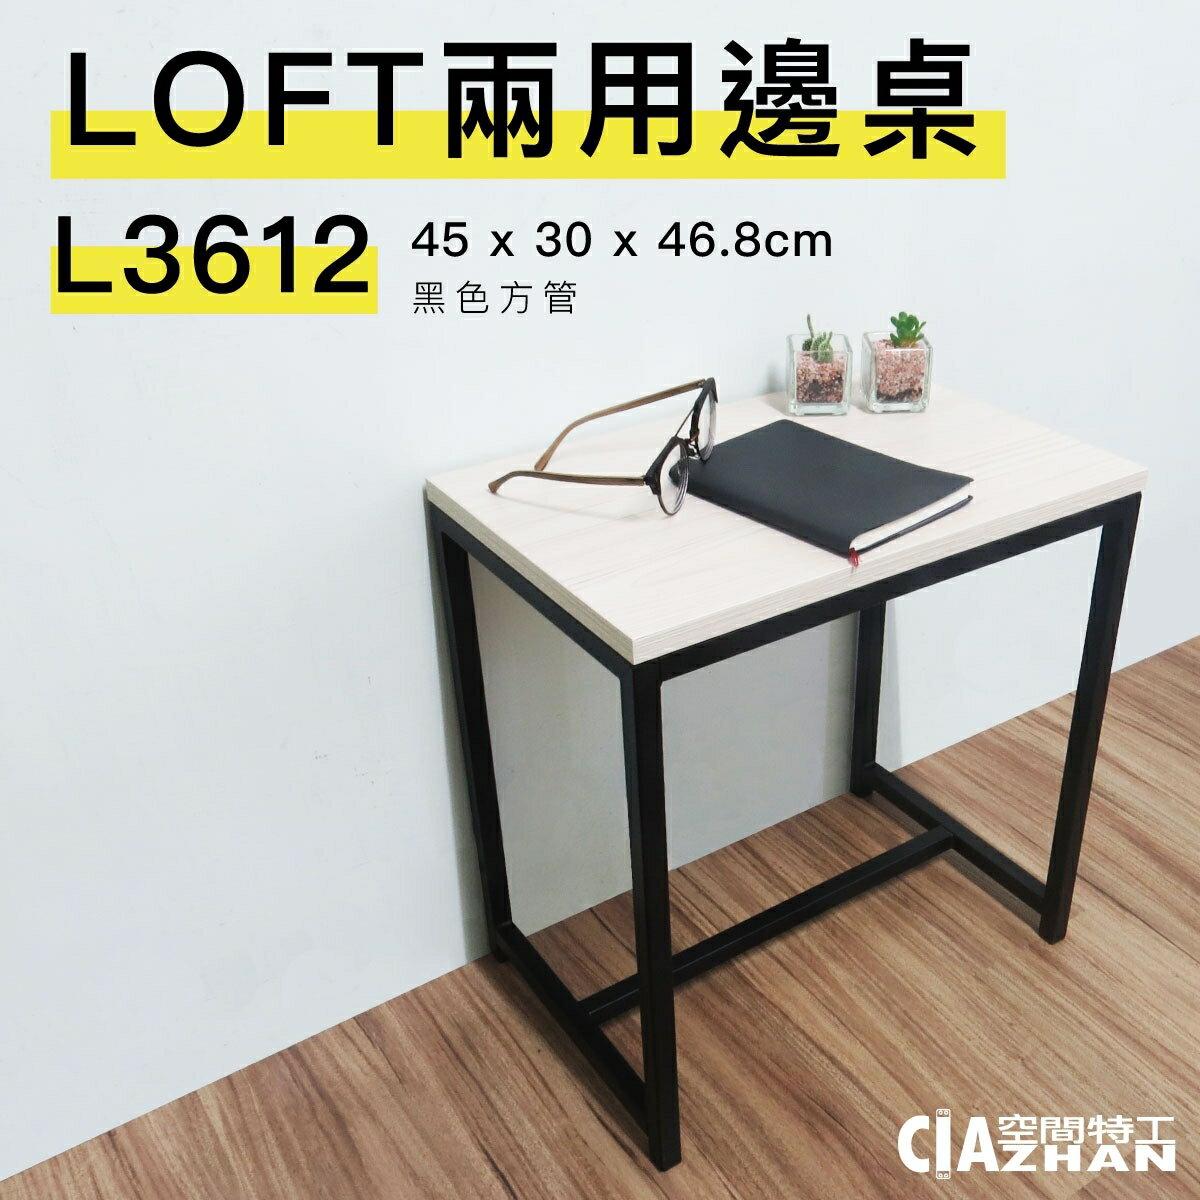 LOFT兩用邊桌(45x30x46.8cm)質感黑 方管椅 茶几 邊桌 工業風 床頭櫃 吧台椅  STB3612 空間特工